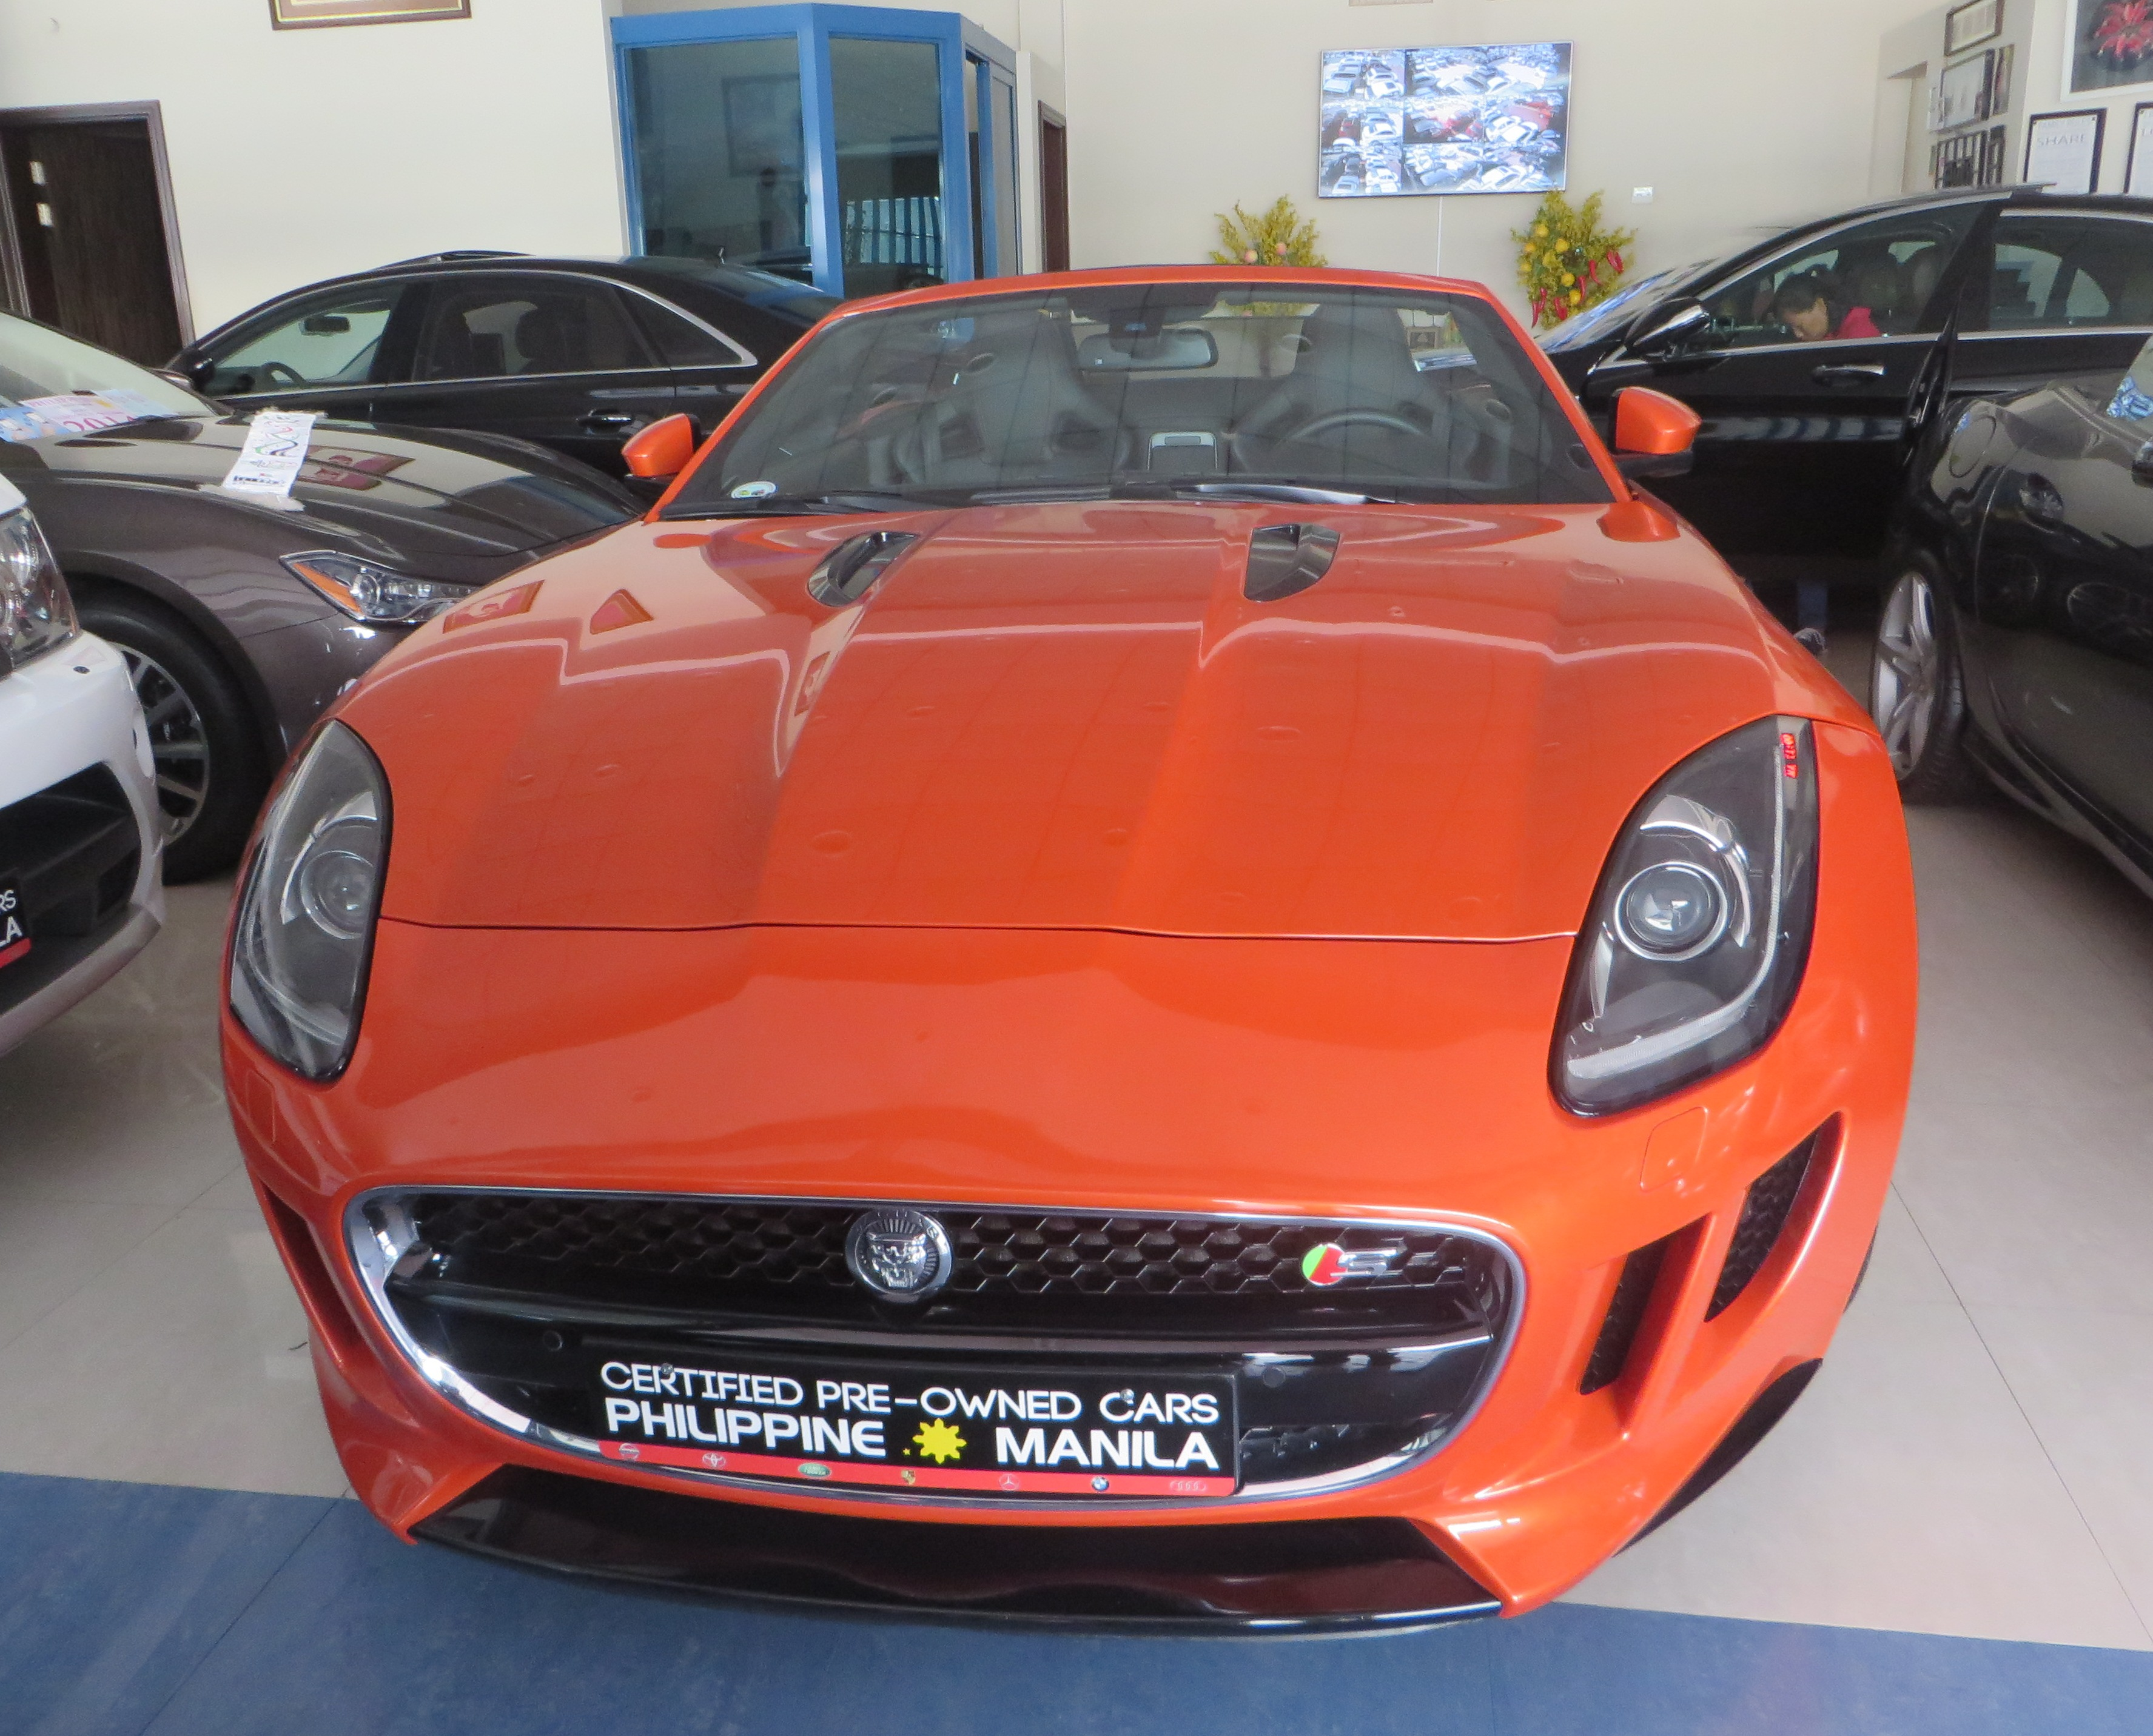 Philippine Car Showroom